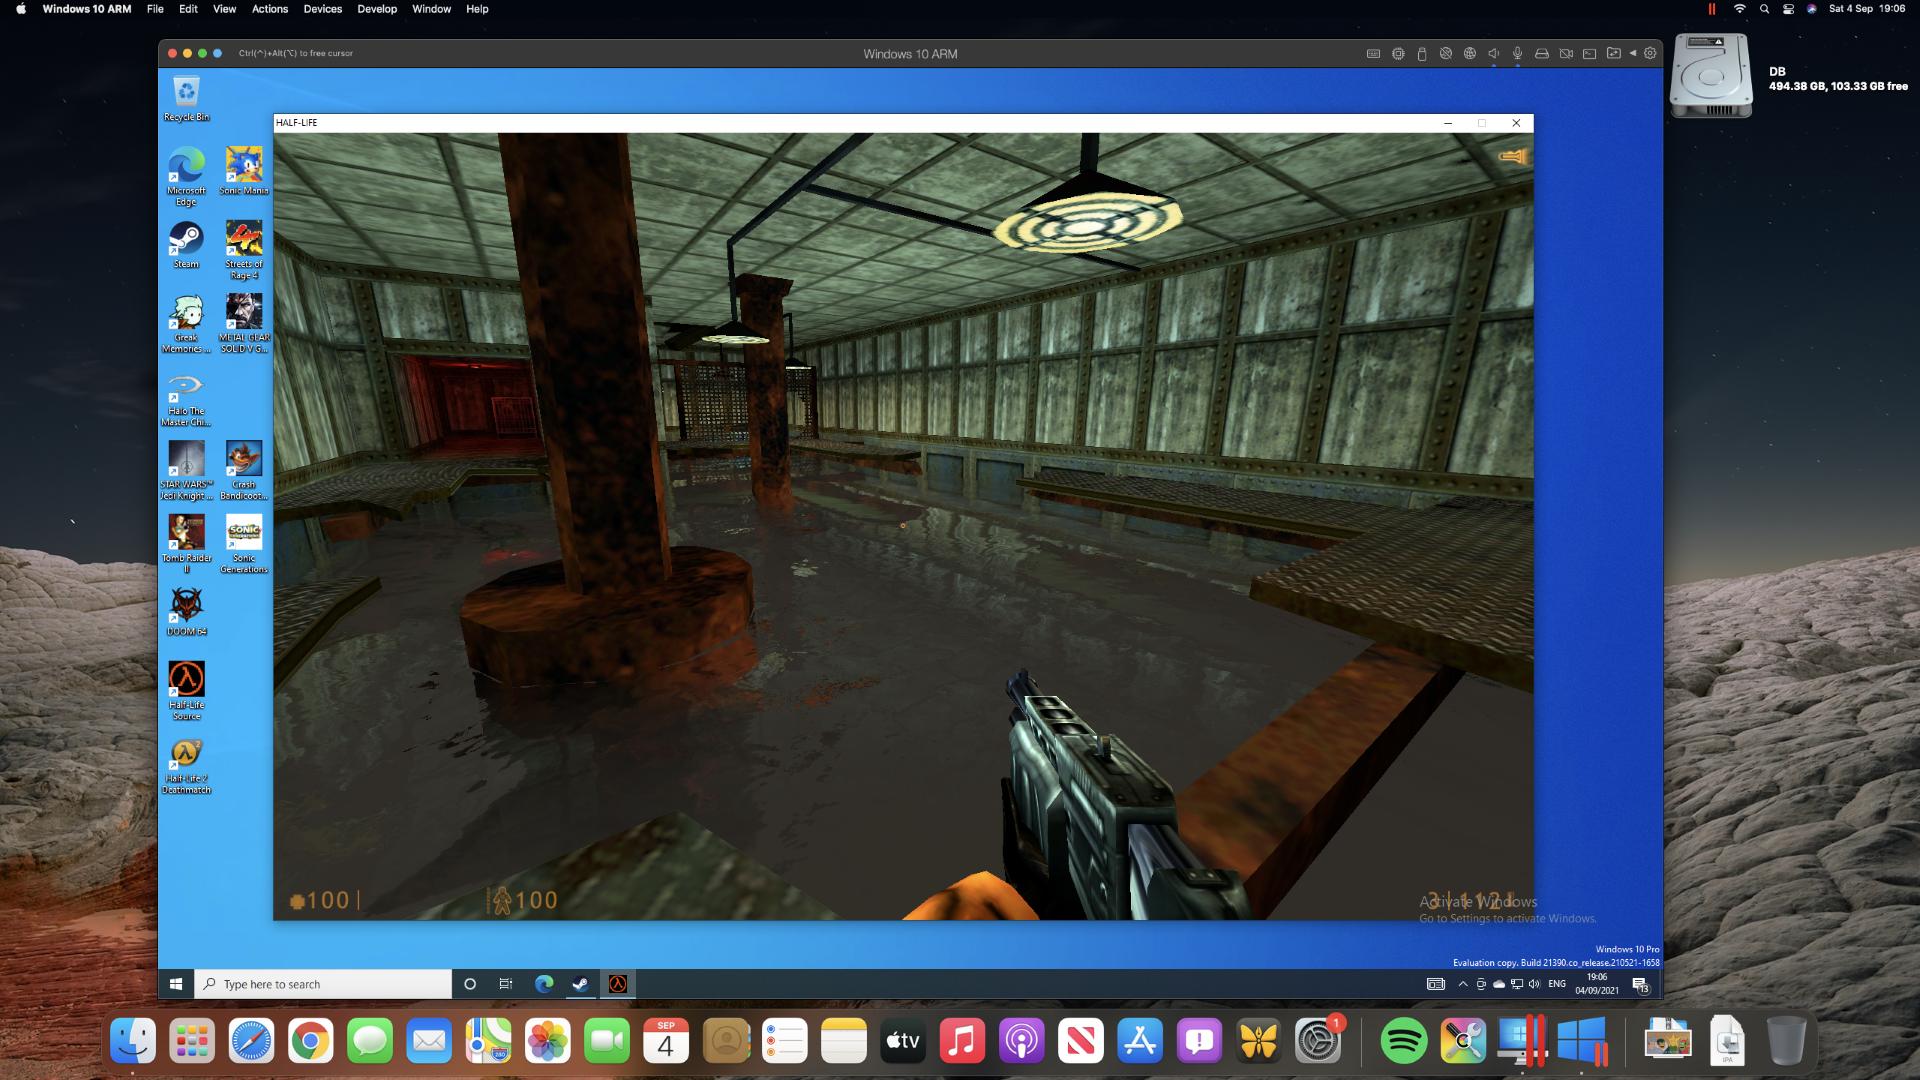 Half Life: Source running in Parallels Desktop on a Mac mini M1